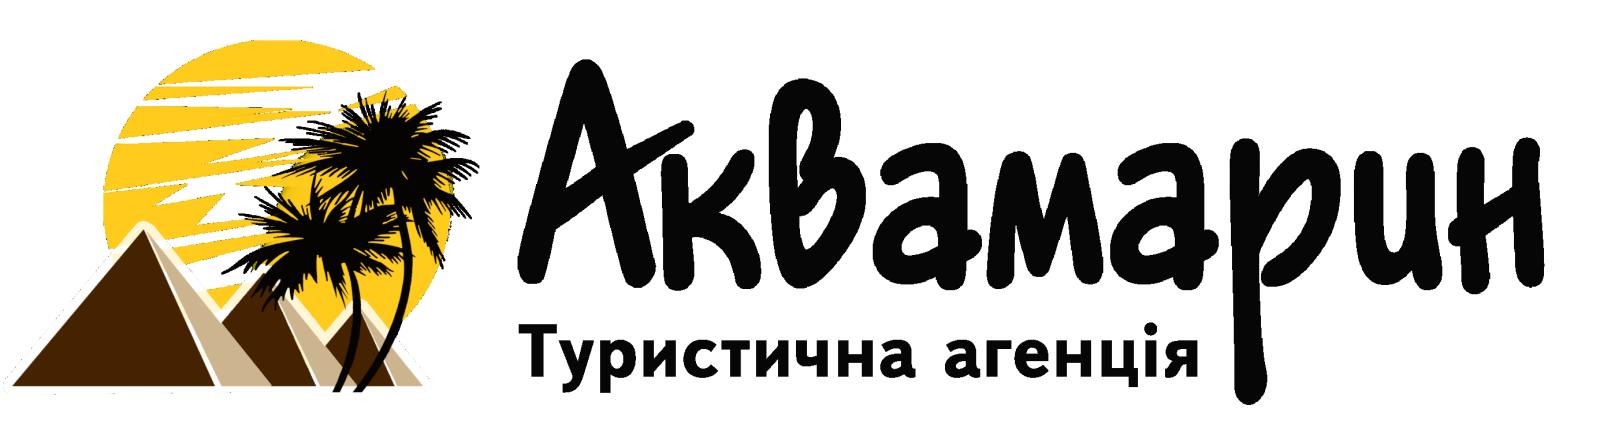 Аквамарин туристична агенція